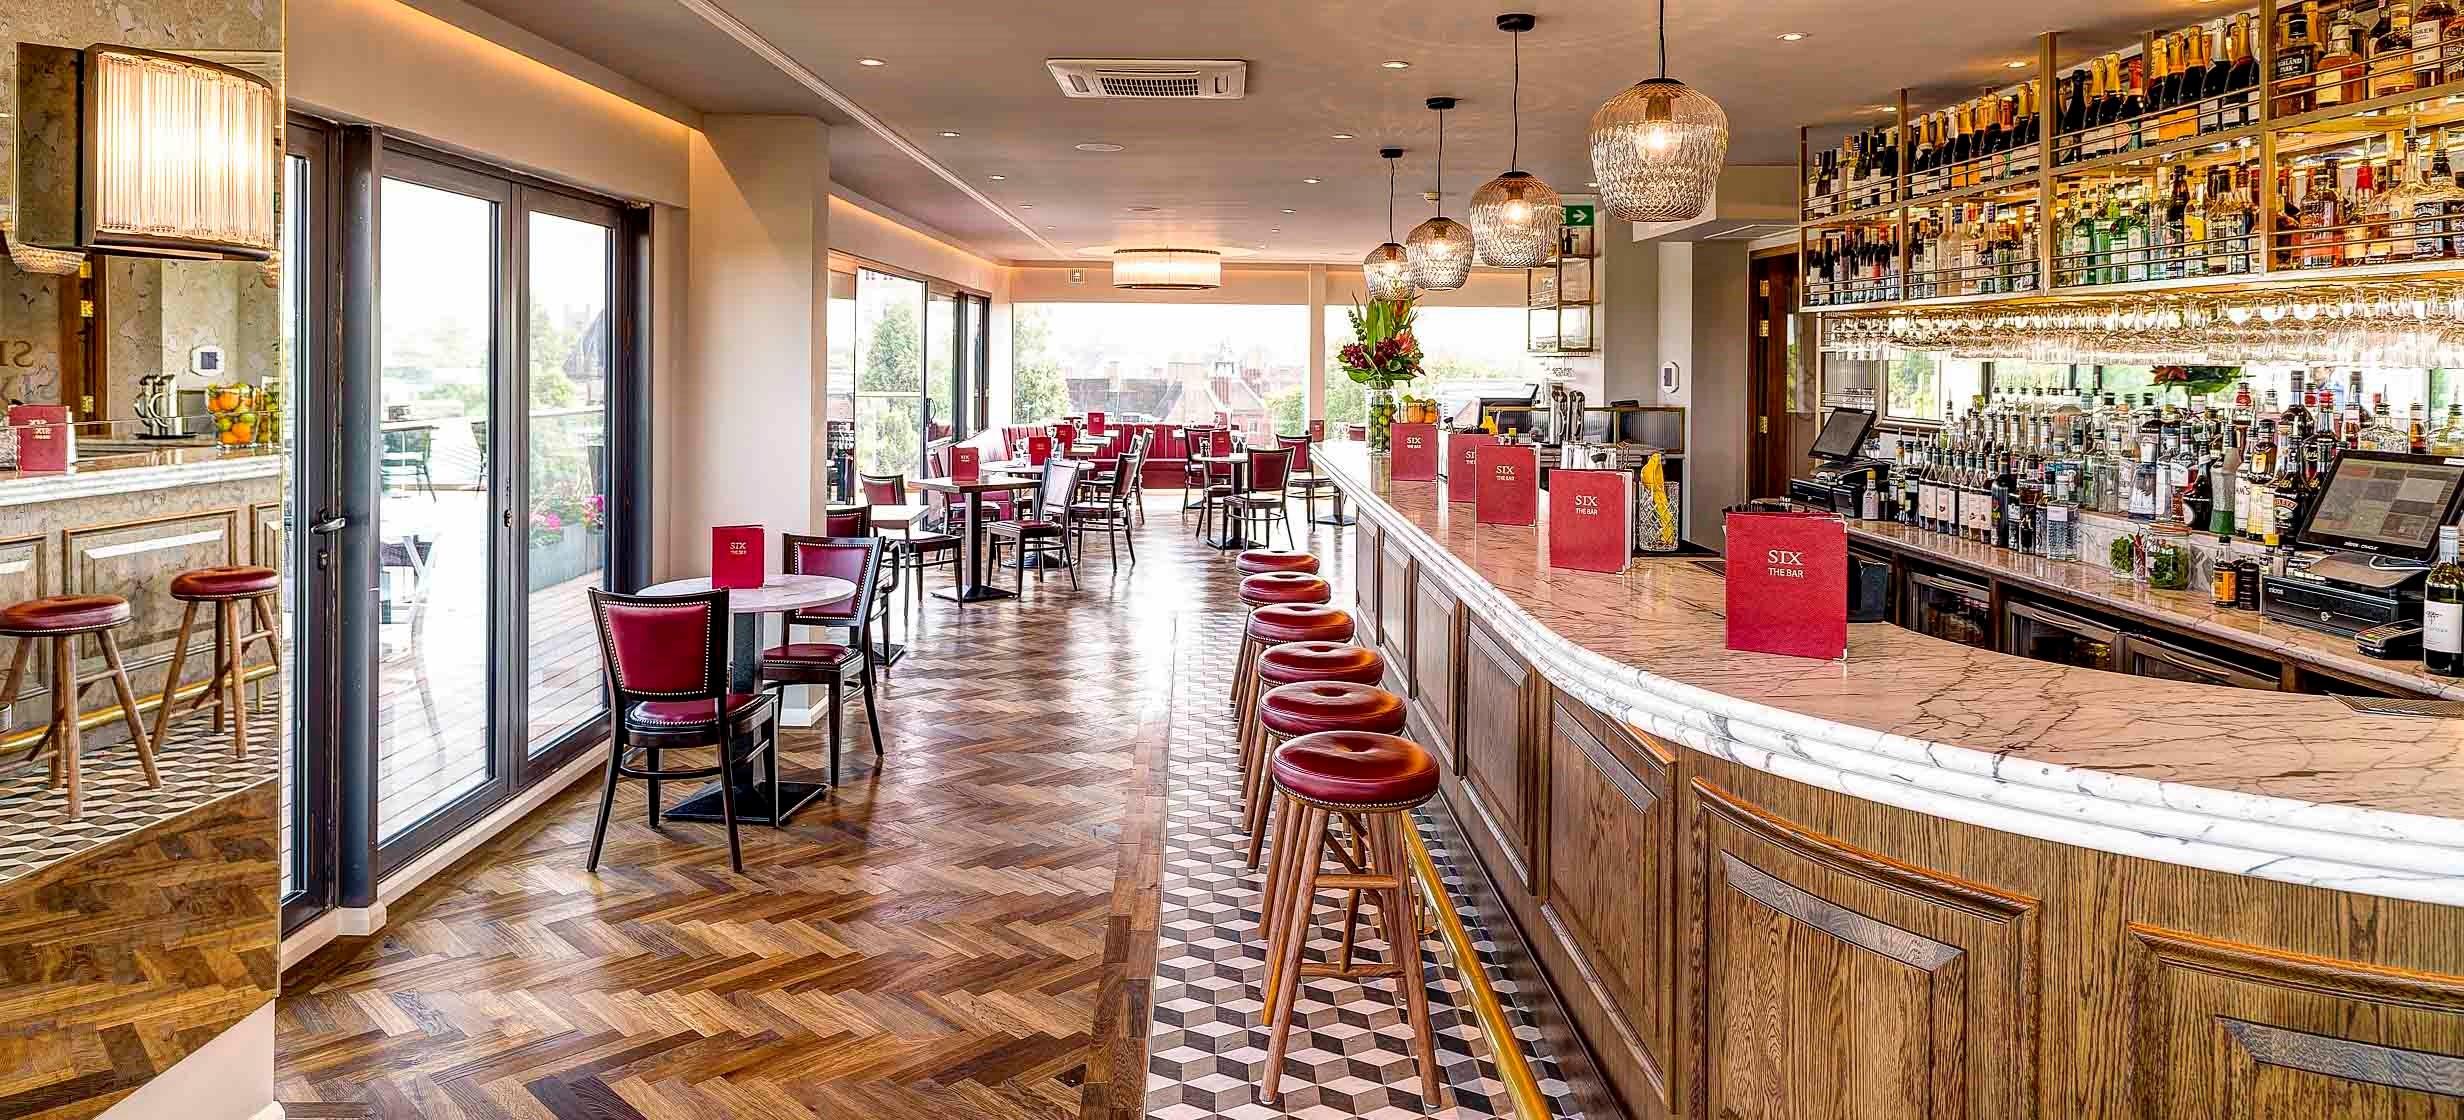 Six Panoramic Bar And Restaurant